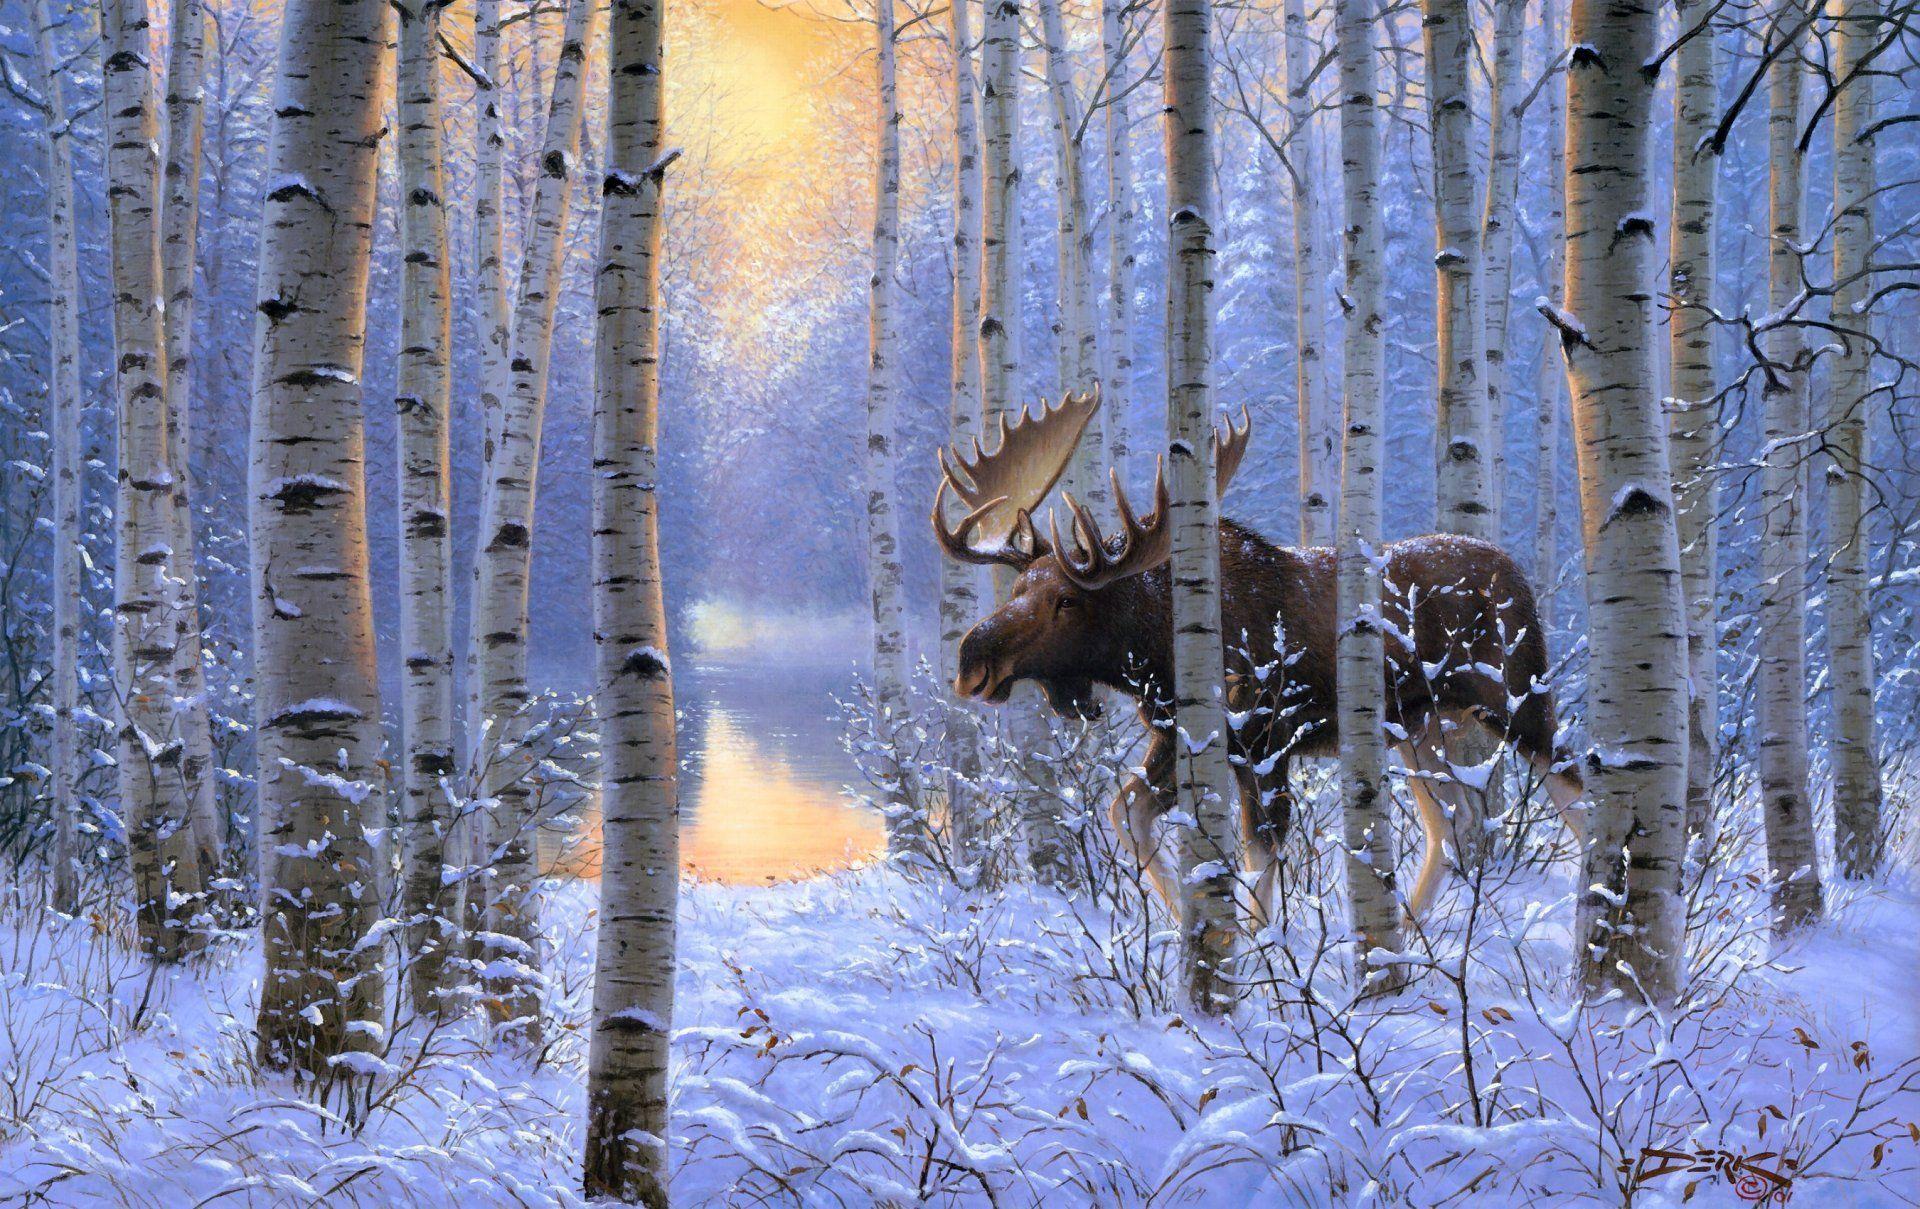 Derk Hansen On The Move Painting Winter Snow Animals Forest Moose Moose Painting Snow Animals Wildlife Artists